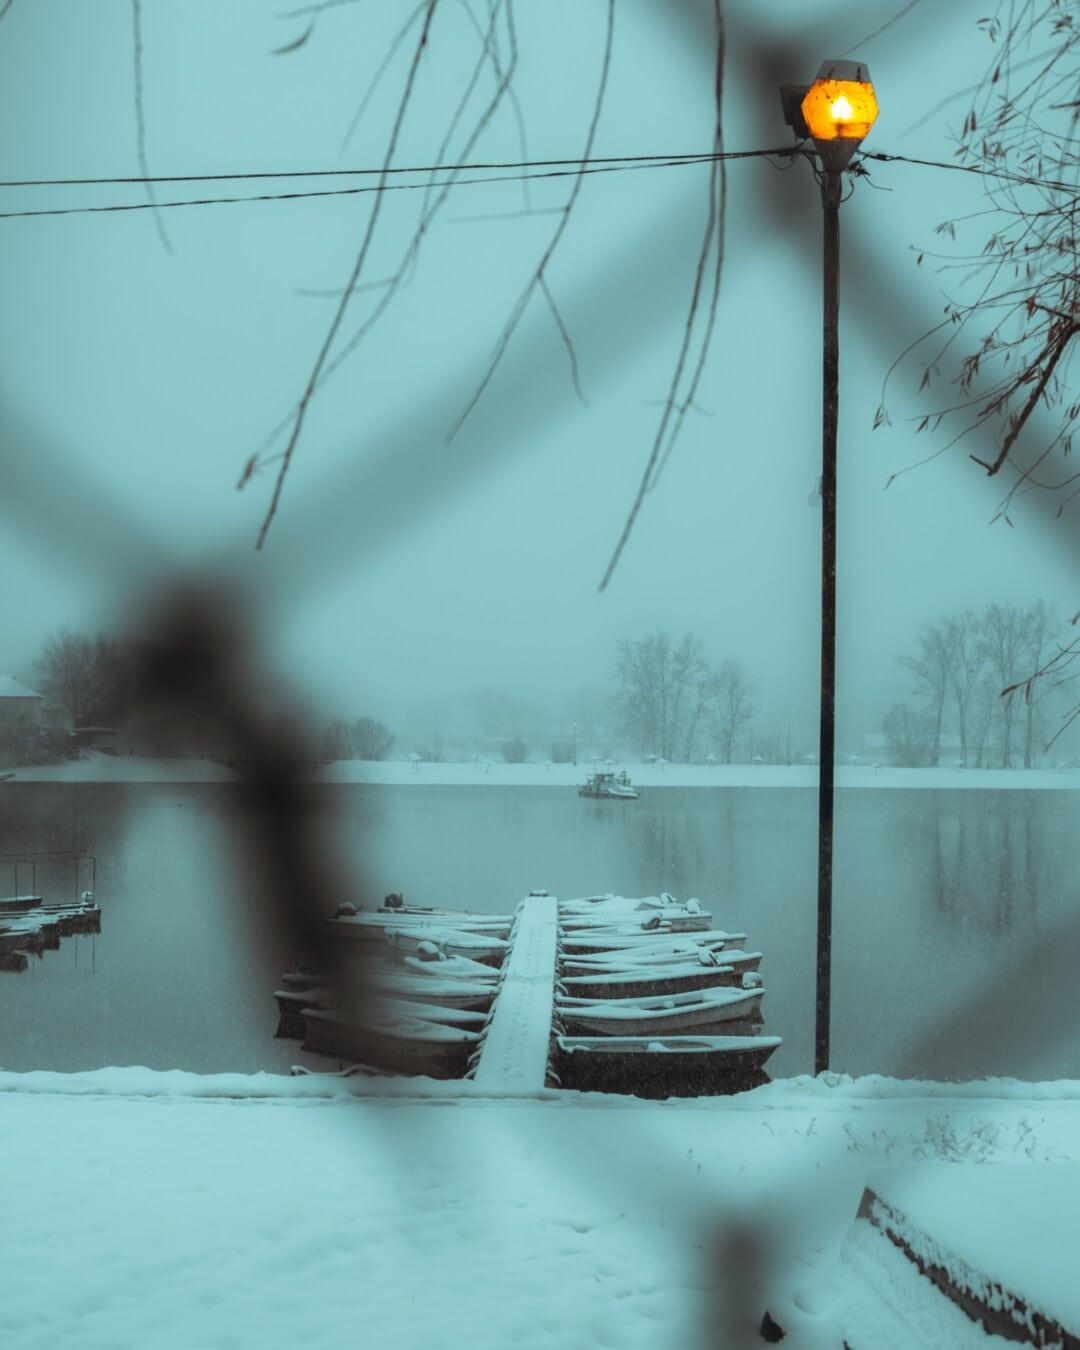 bateau de rivière, jetée, berge, soirée, Hiver, neige, brouillard, eau, brume, bois